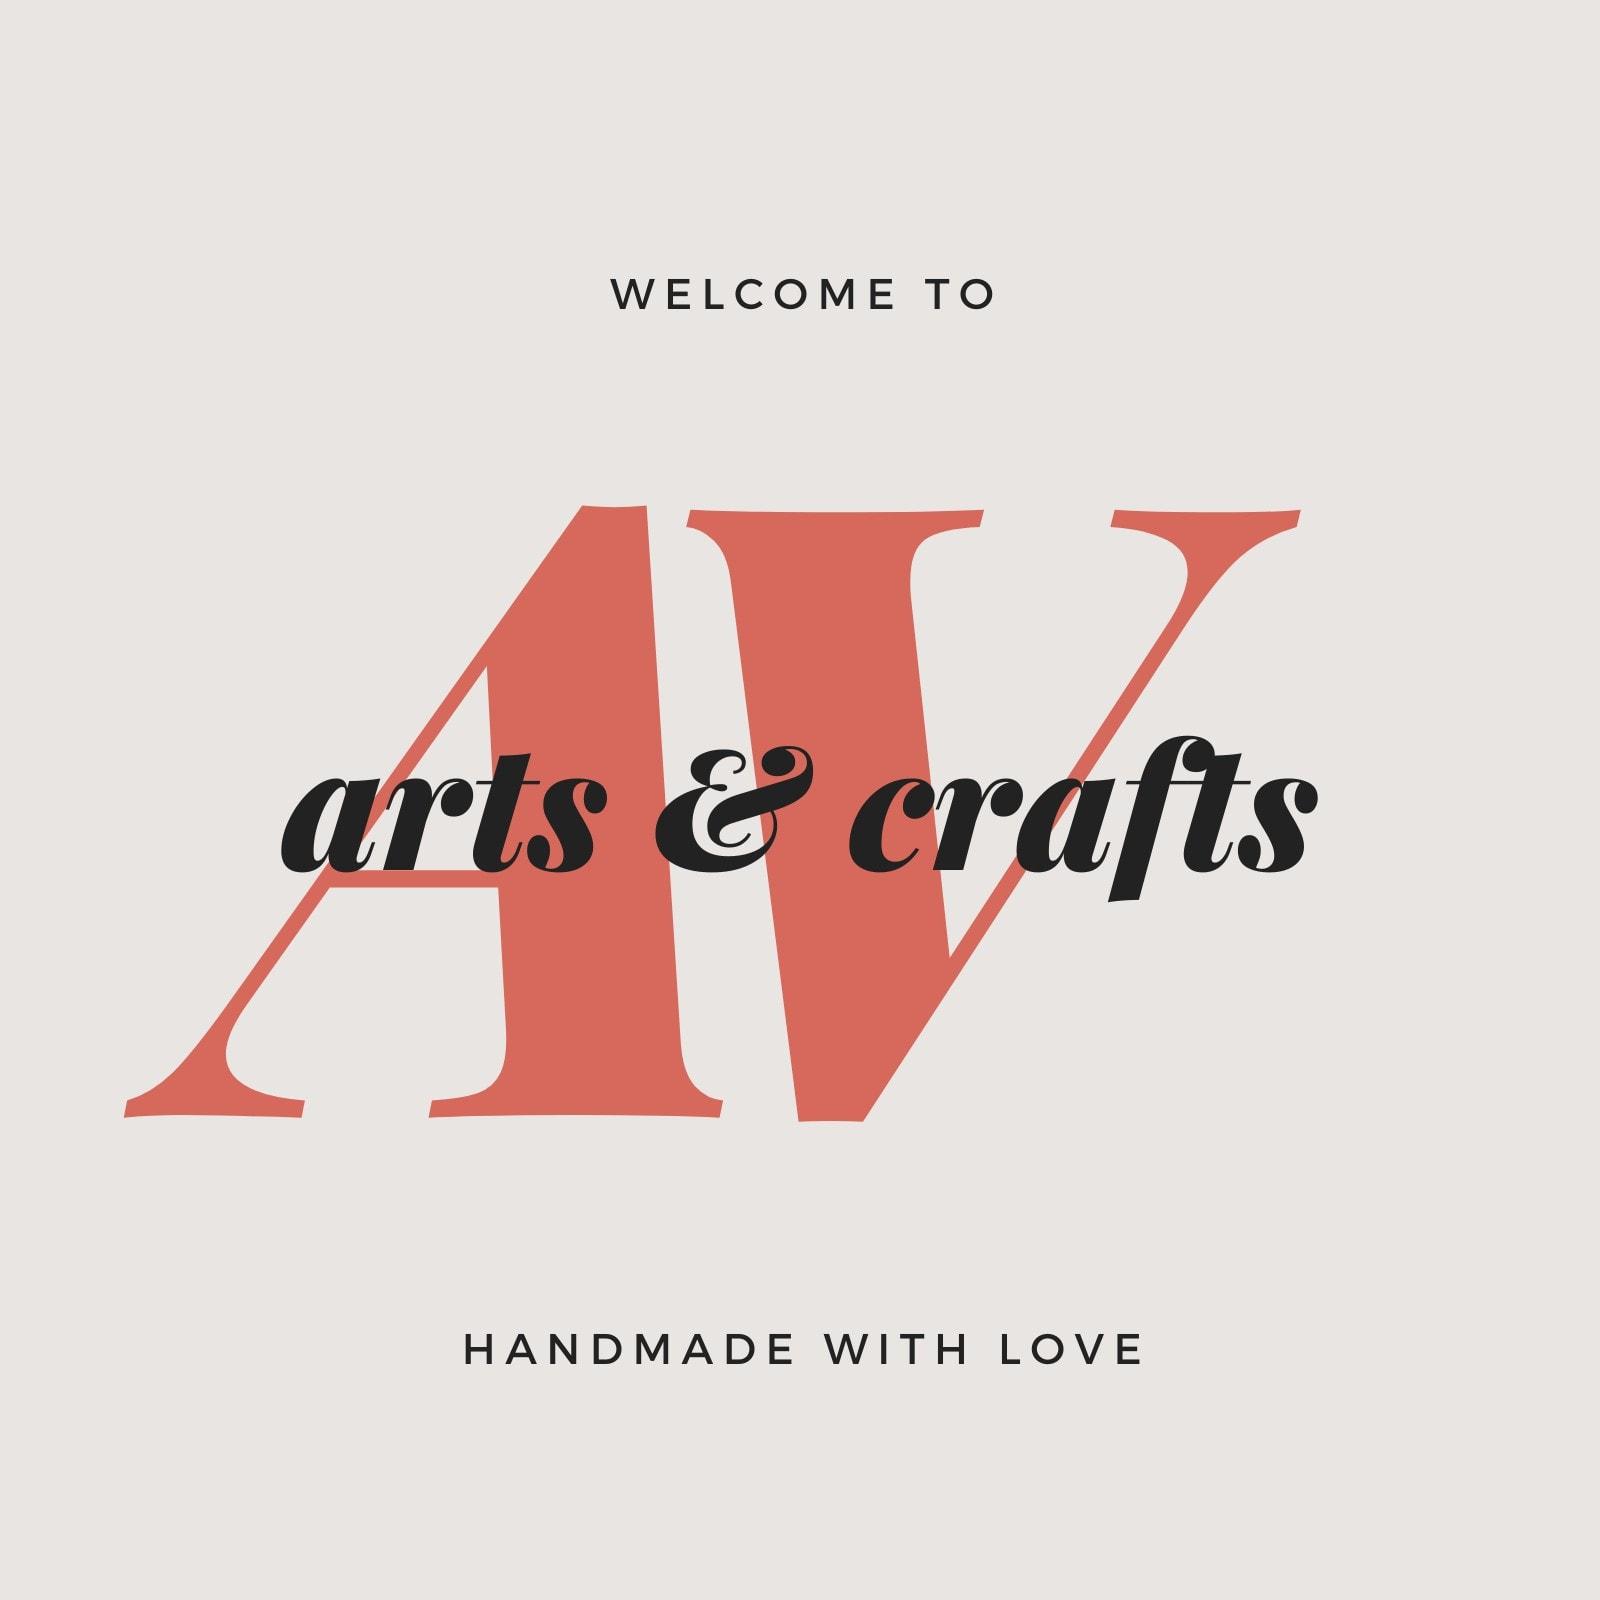 Clean Modern Arts Crafts Etsy Shop Icon